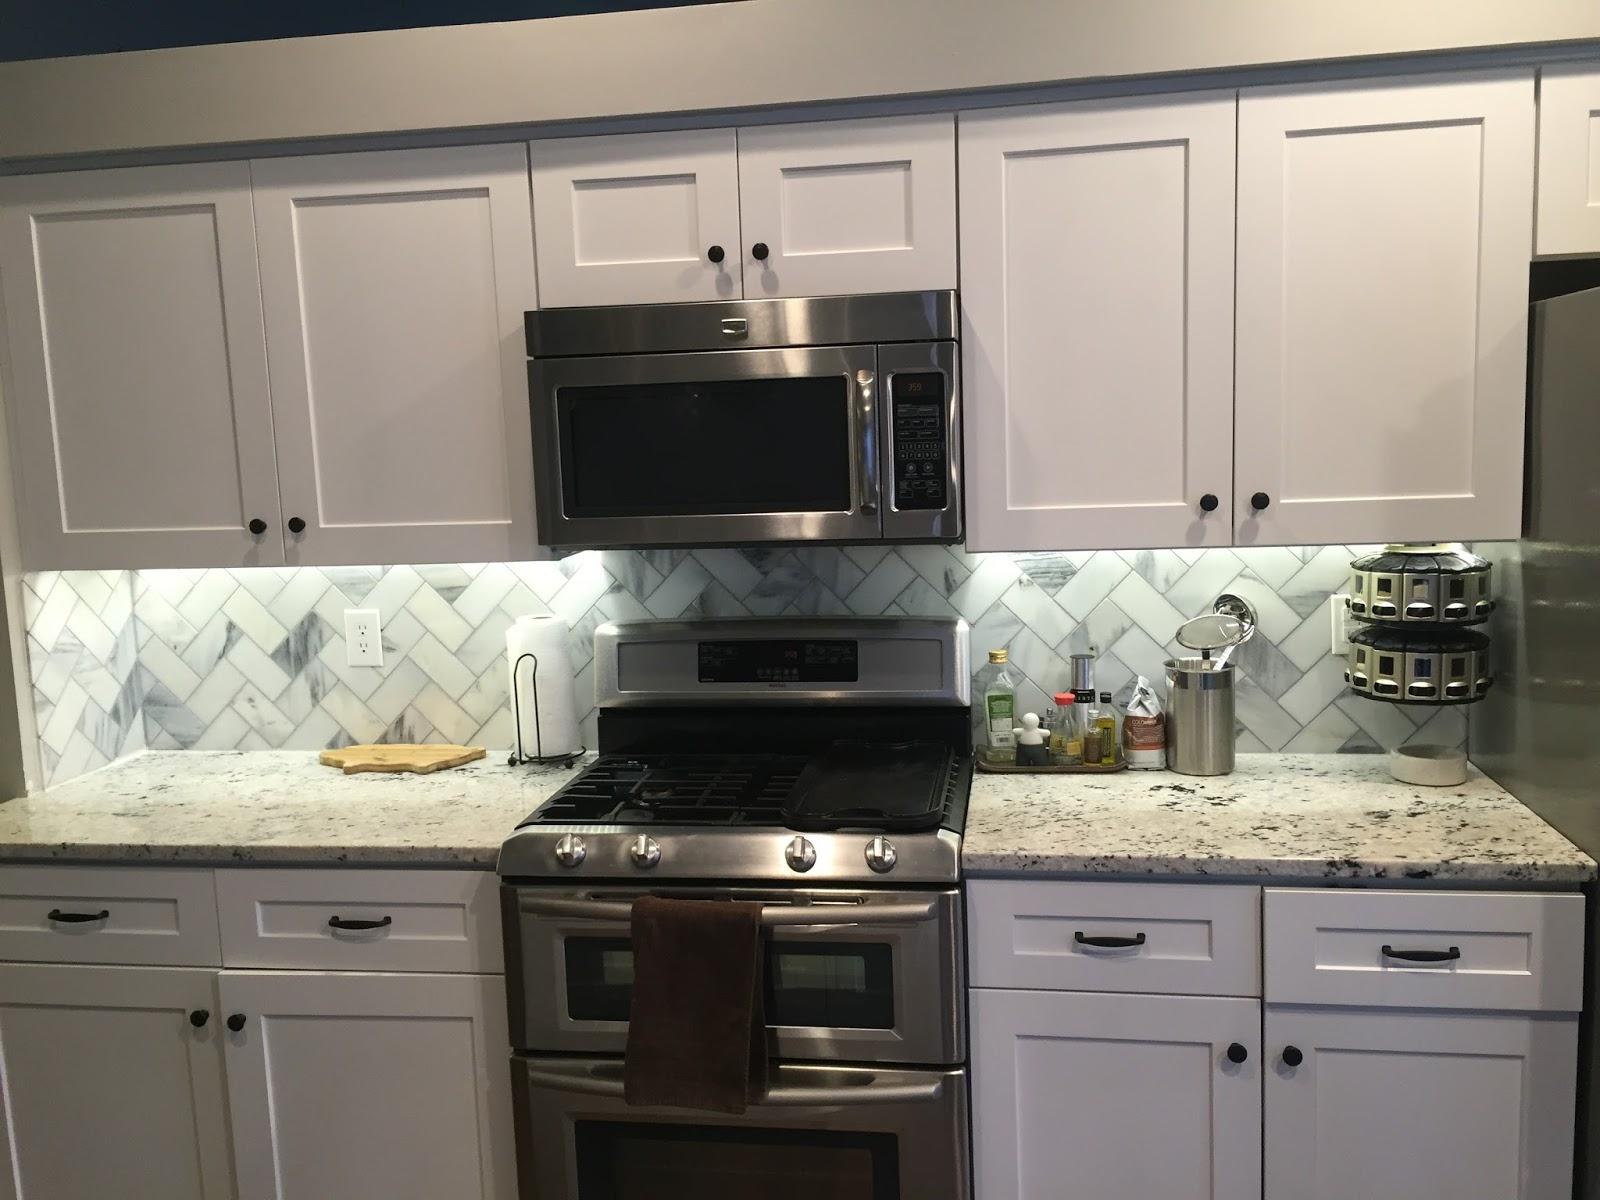 Wiring Under Cabinet Lighting Kitchen Wiring Circuit Diagrams